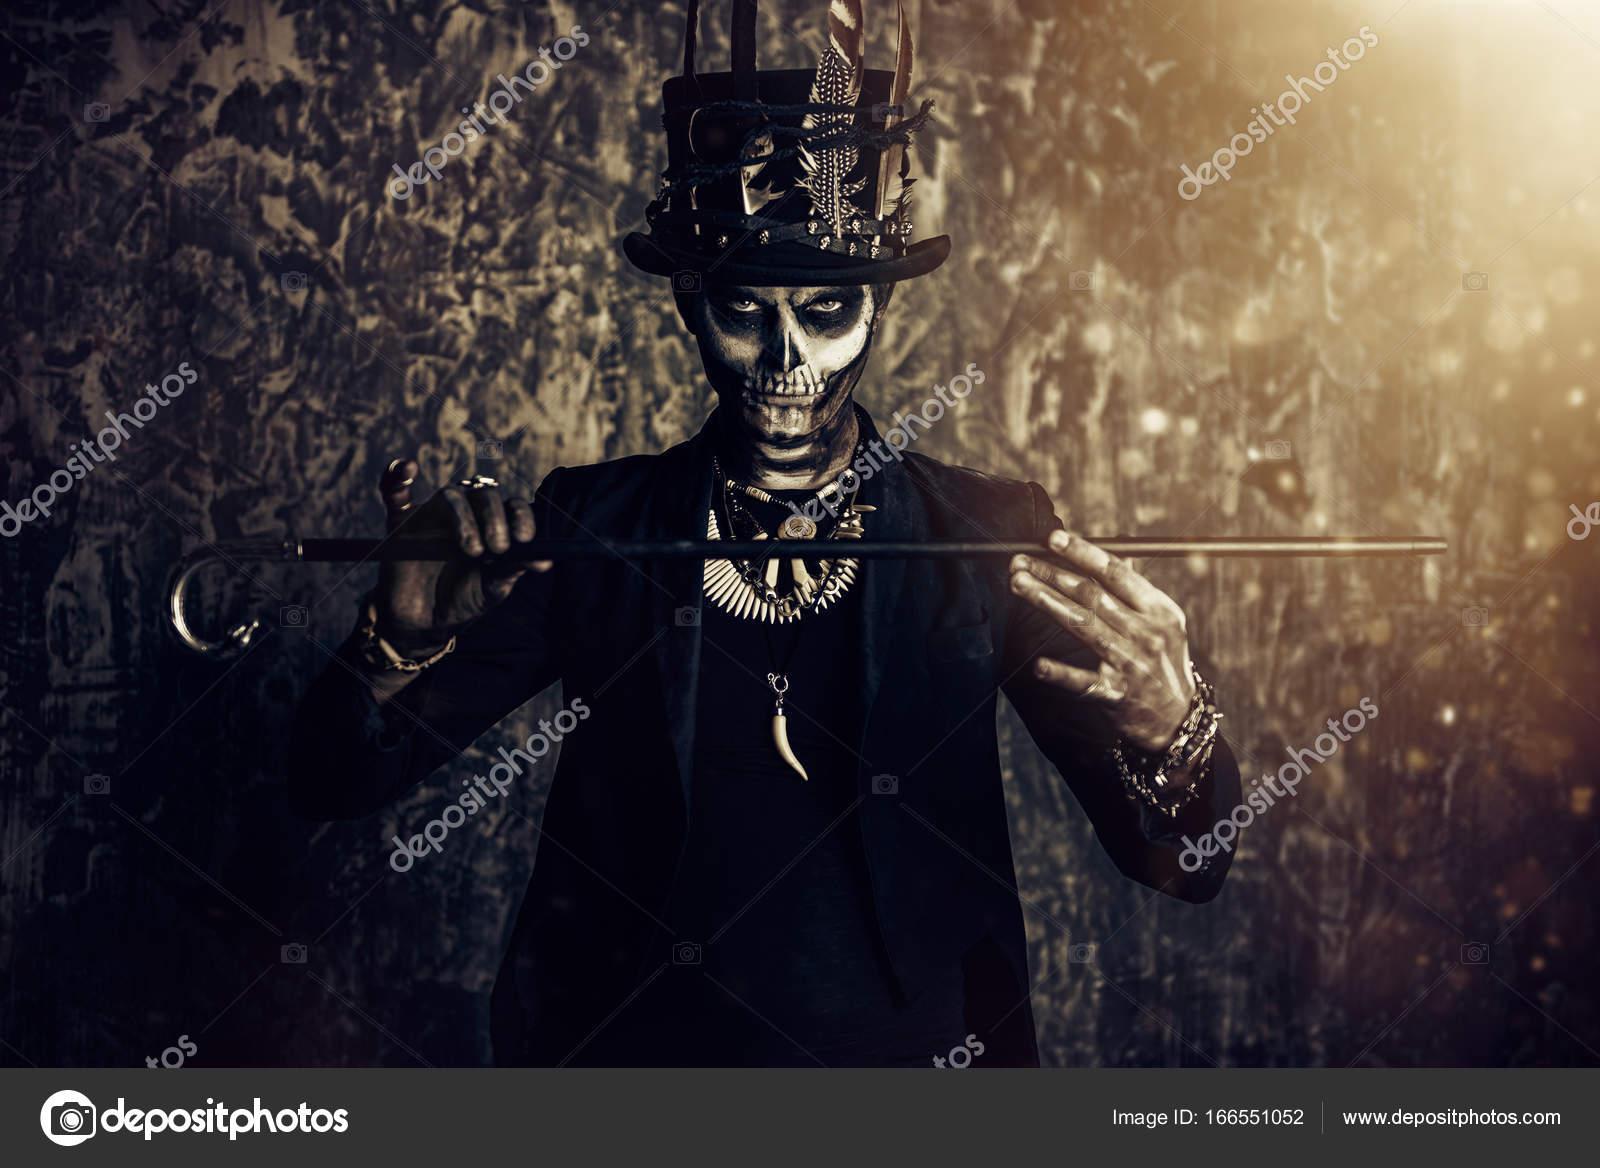 hombre esqueleto Scary Fotos de Stock prometeus 166551052